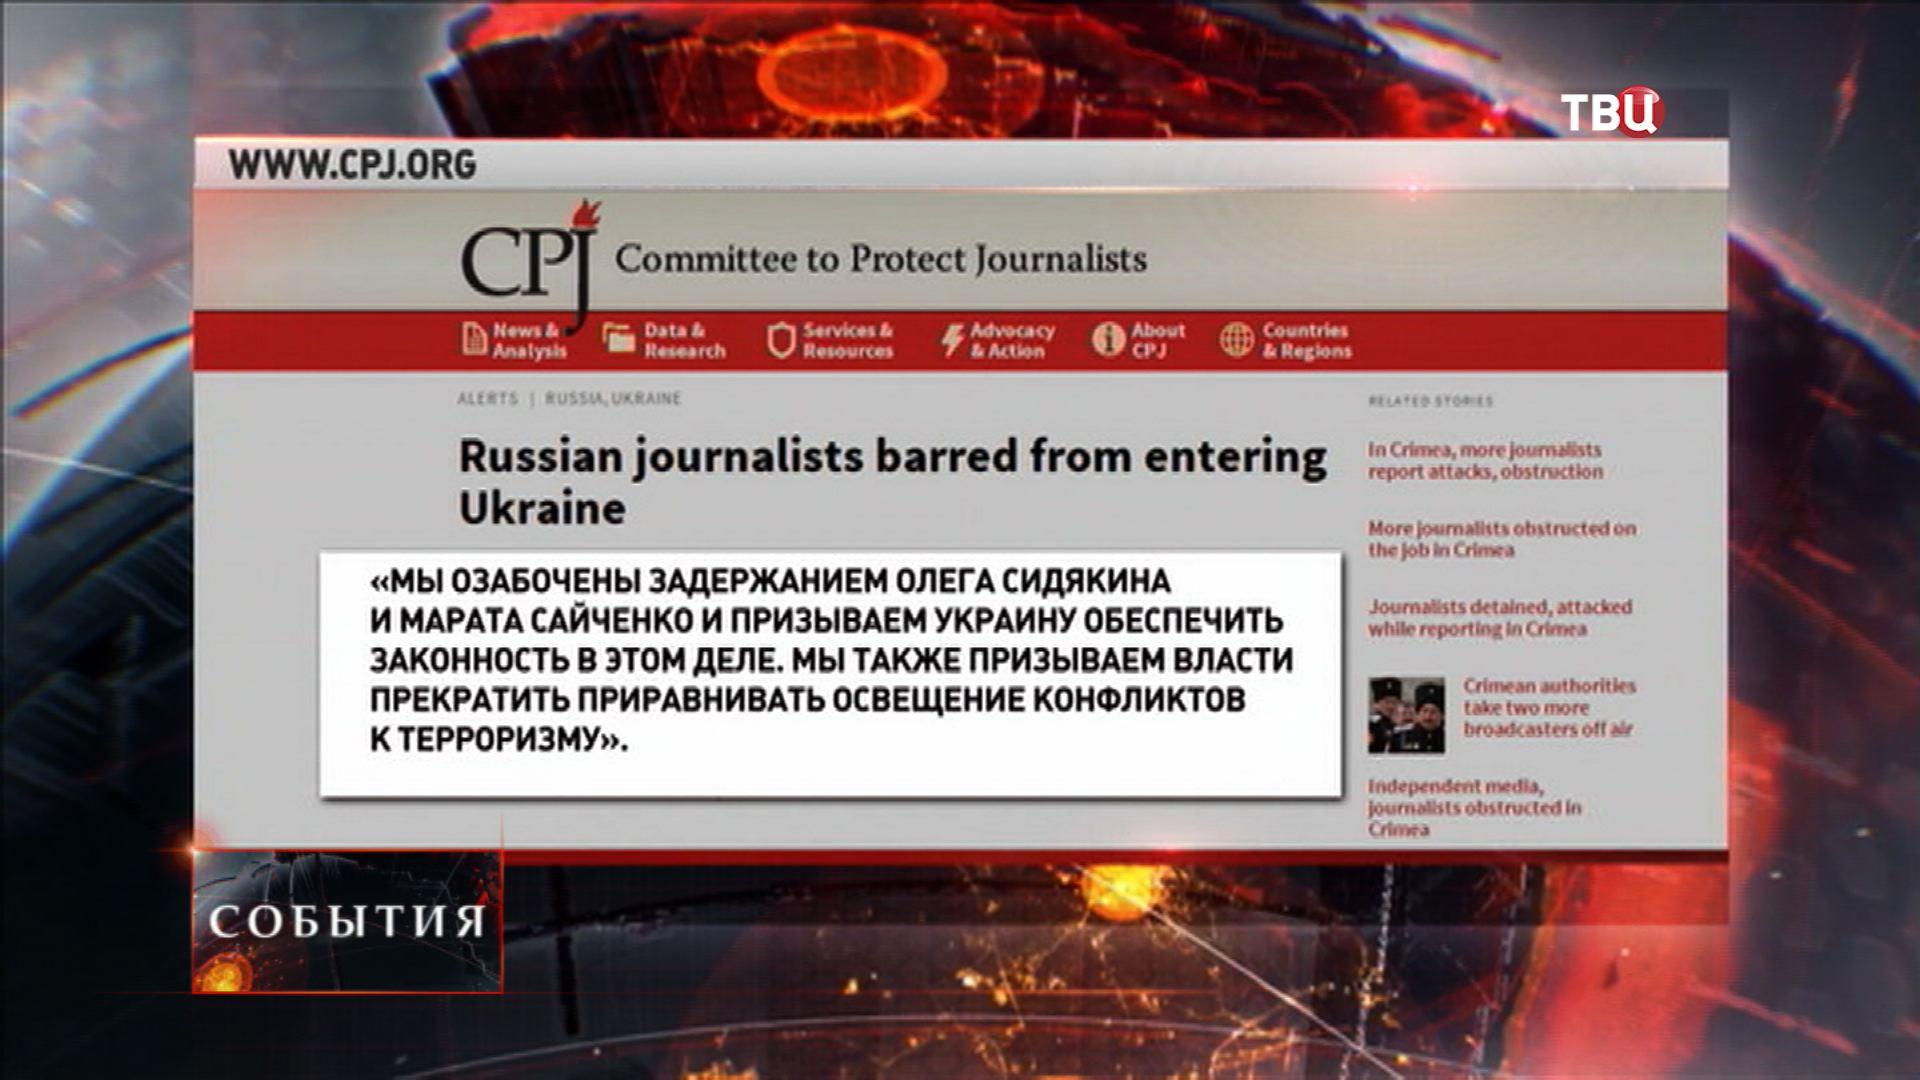 Сайт www.CPJ.ORG